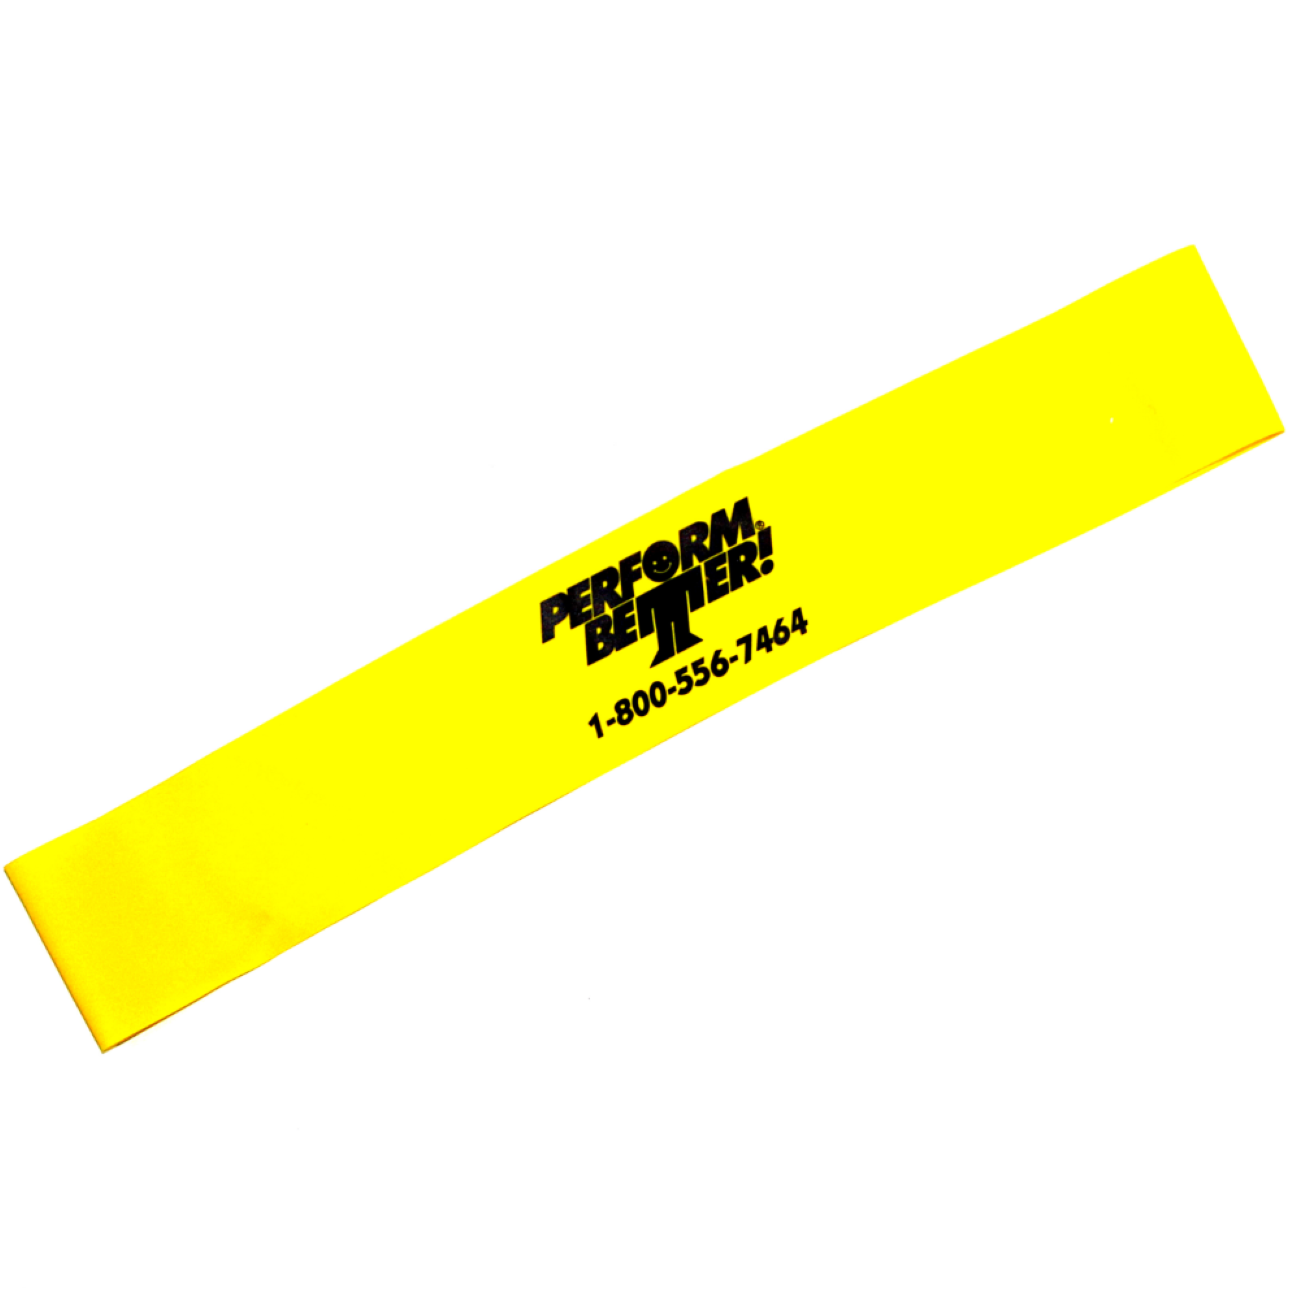 Performbetter ミニバンドXL【Mini Bands】 トップアスリートもご用達 ミニバンドといえばこれ!